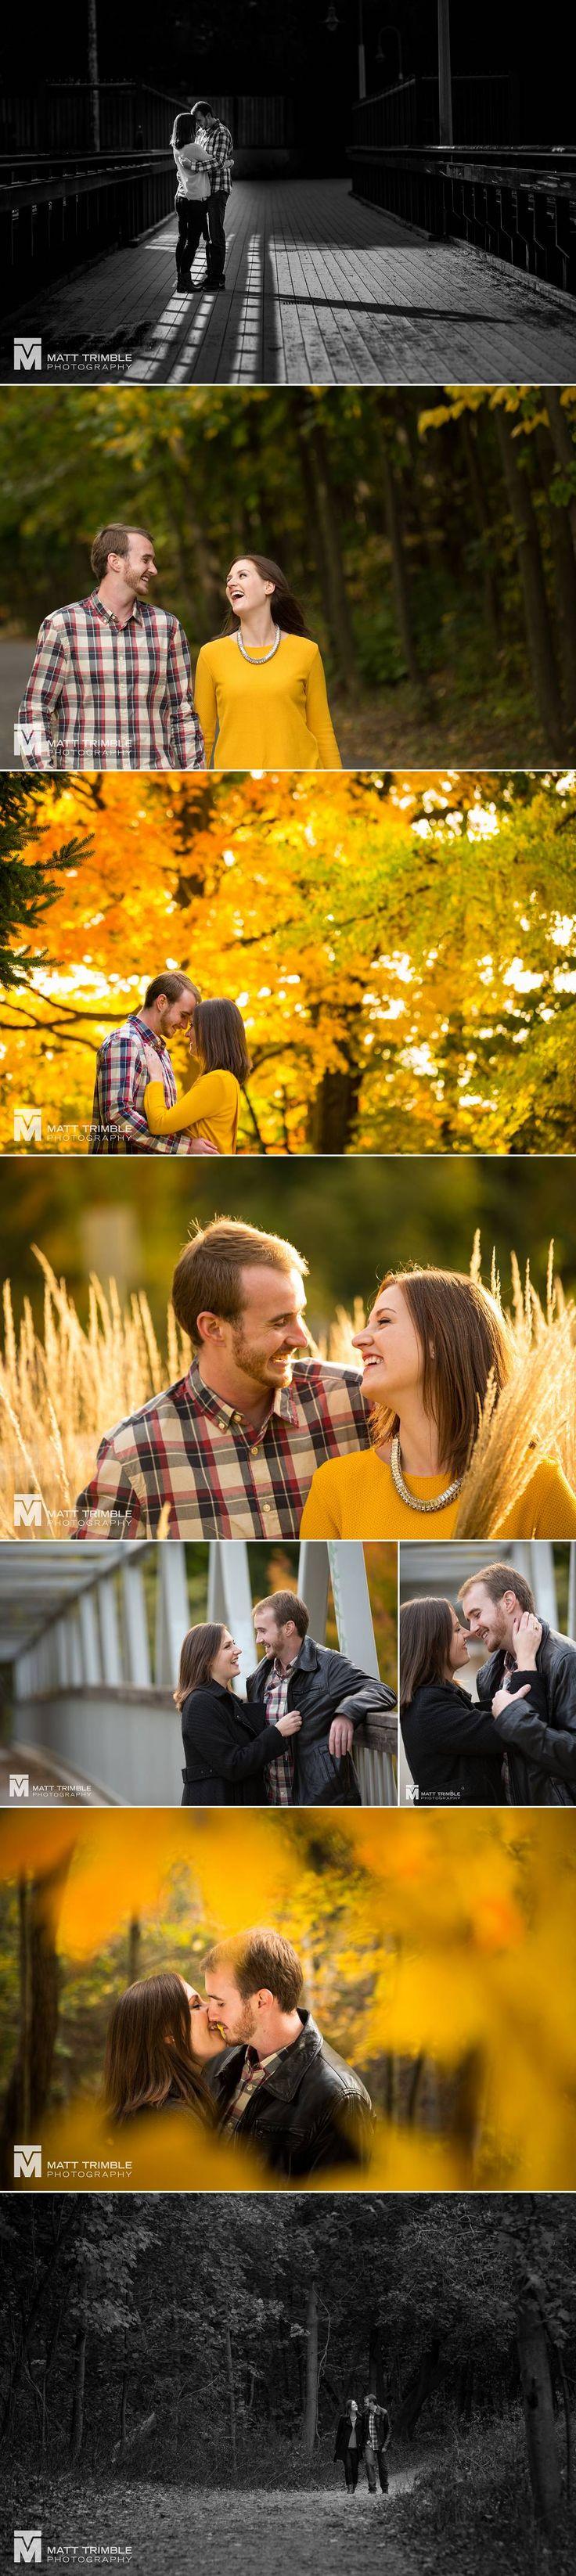 Engagement photography in Toronto Beltline Park